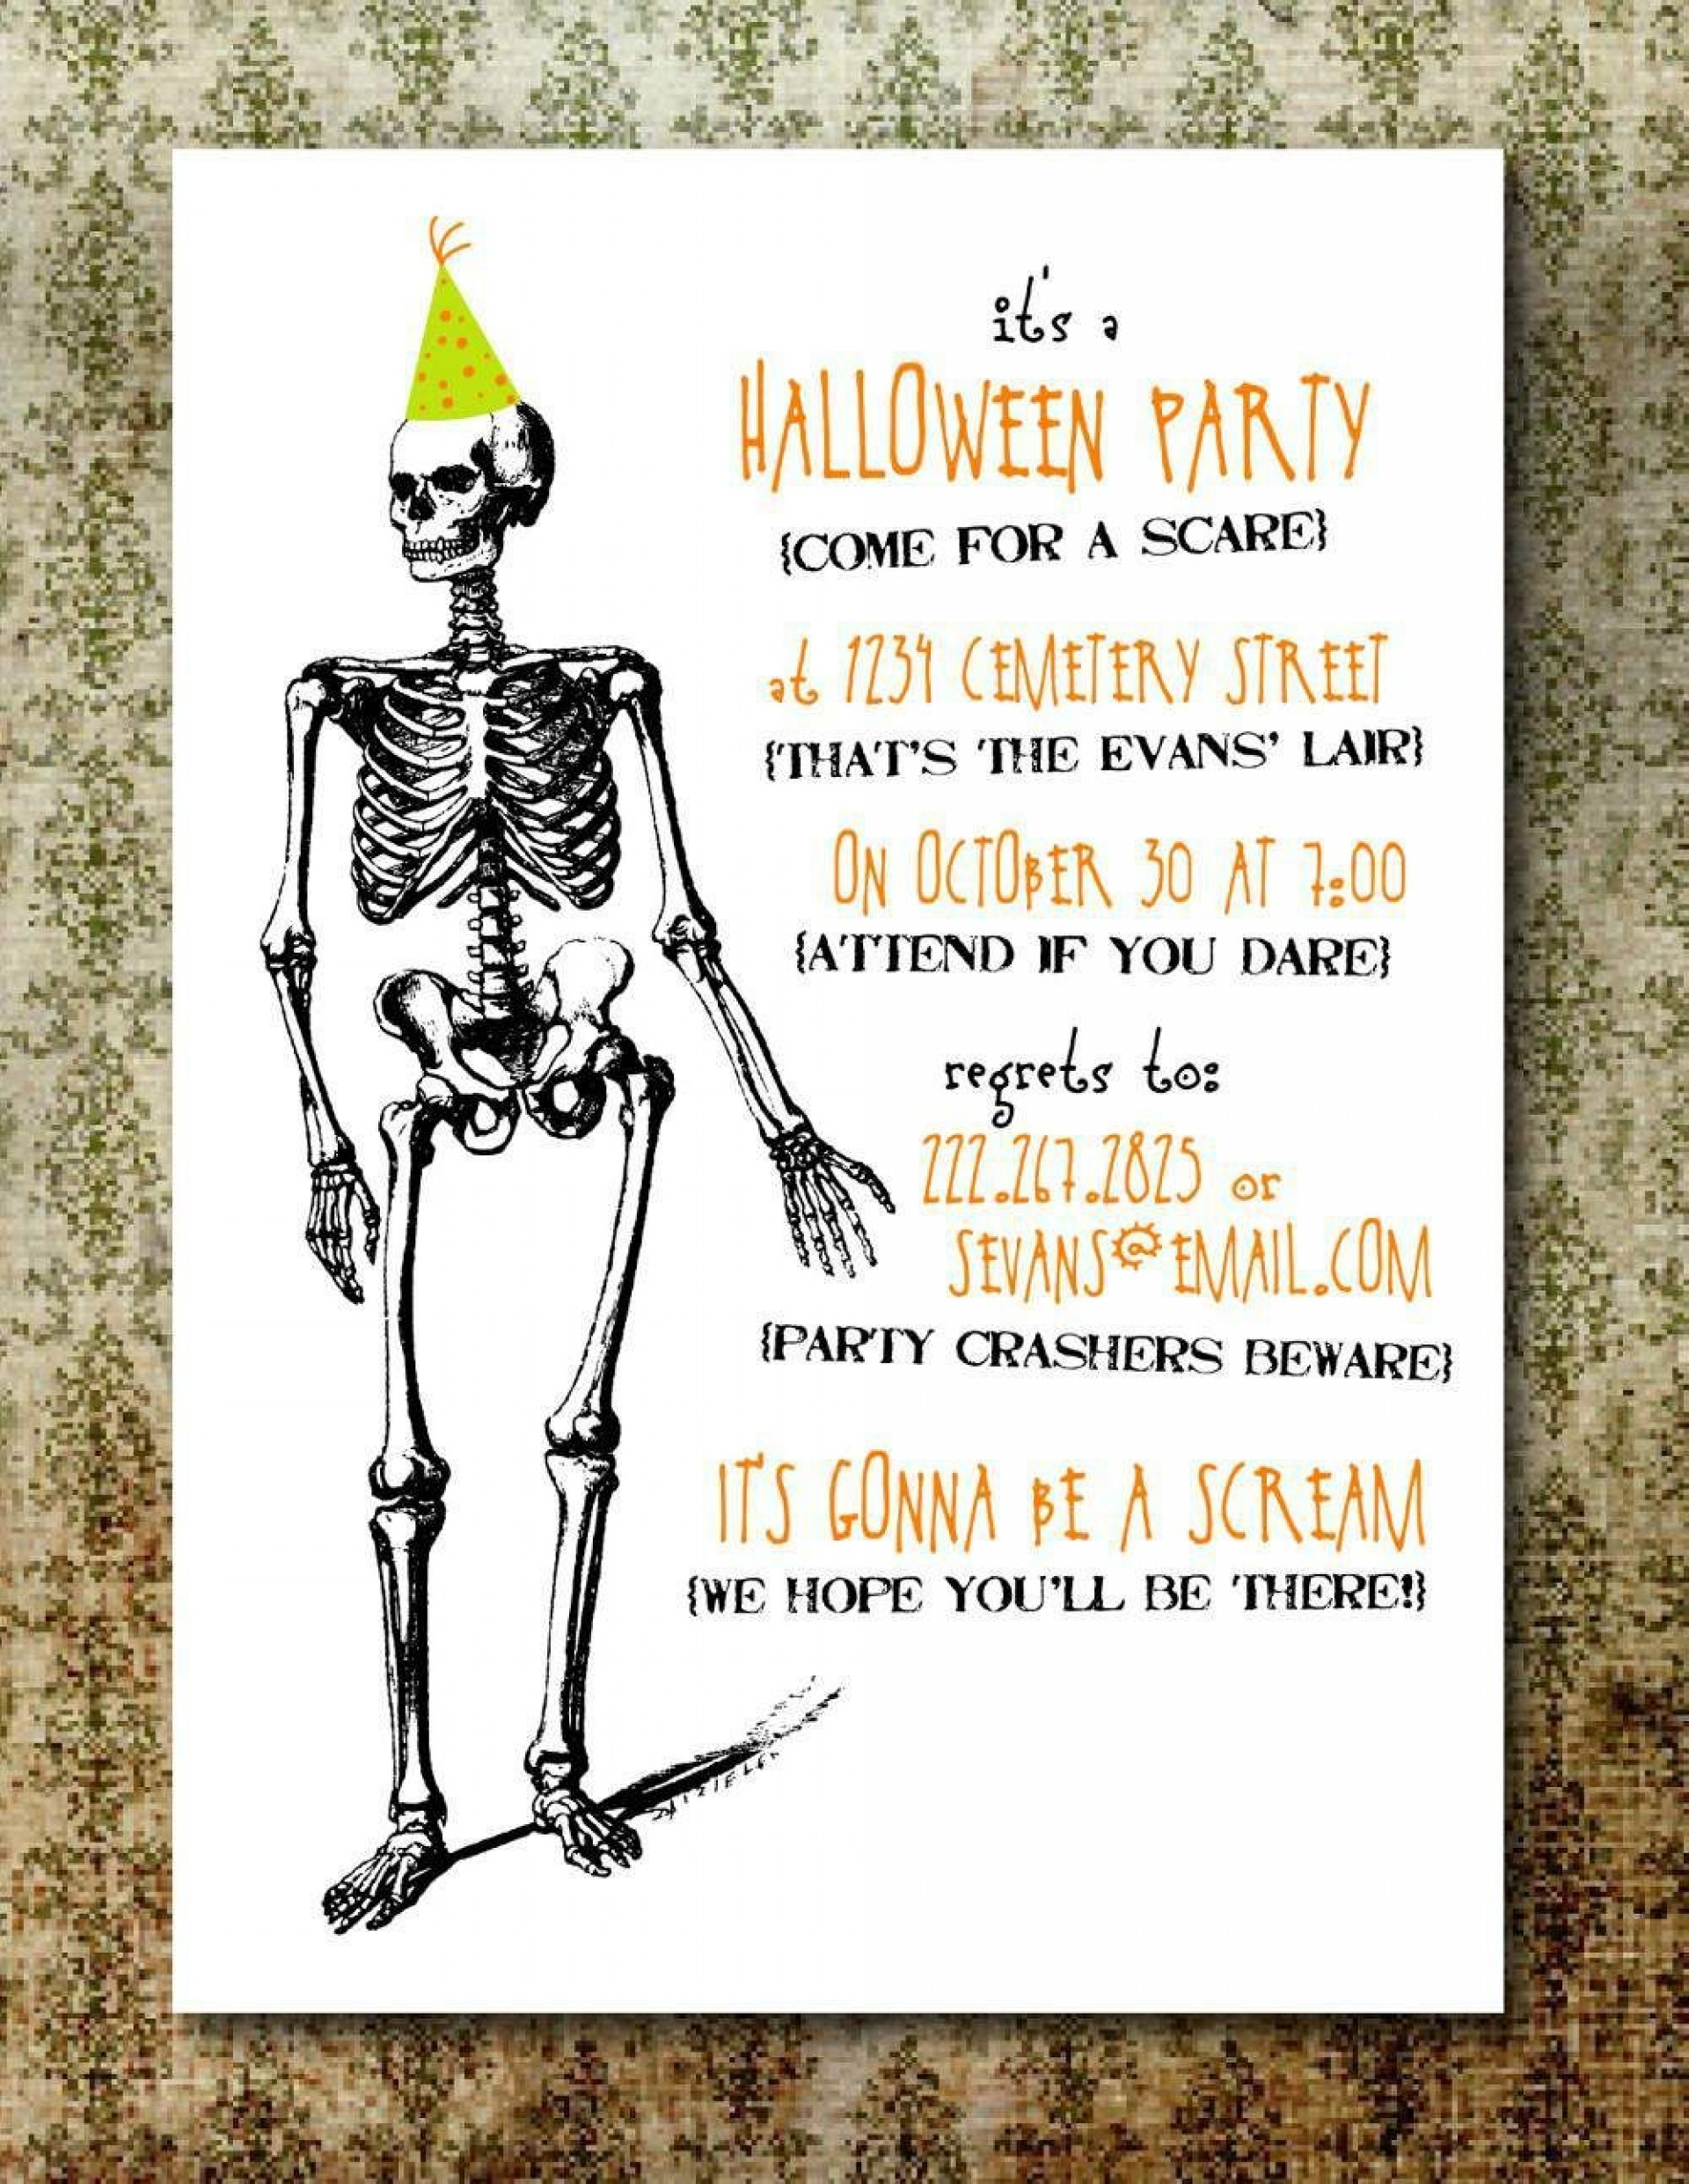 004 Fantastic Free Halloween Invitation Template Concept  Templates Online Printable Birthday Party Wedding1920